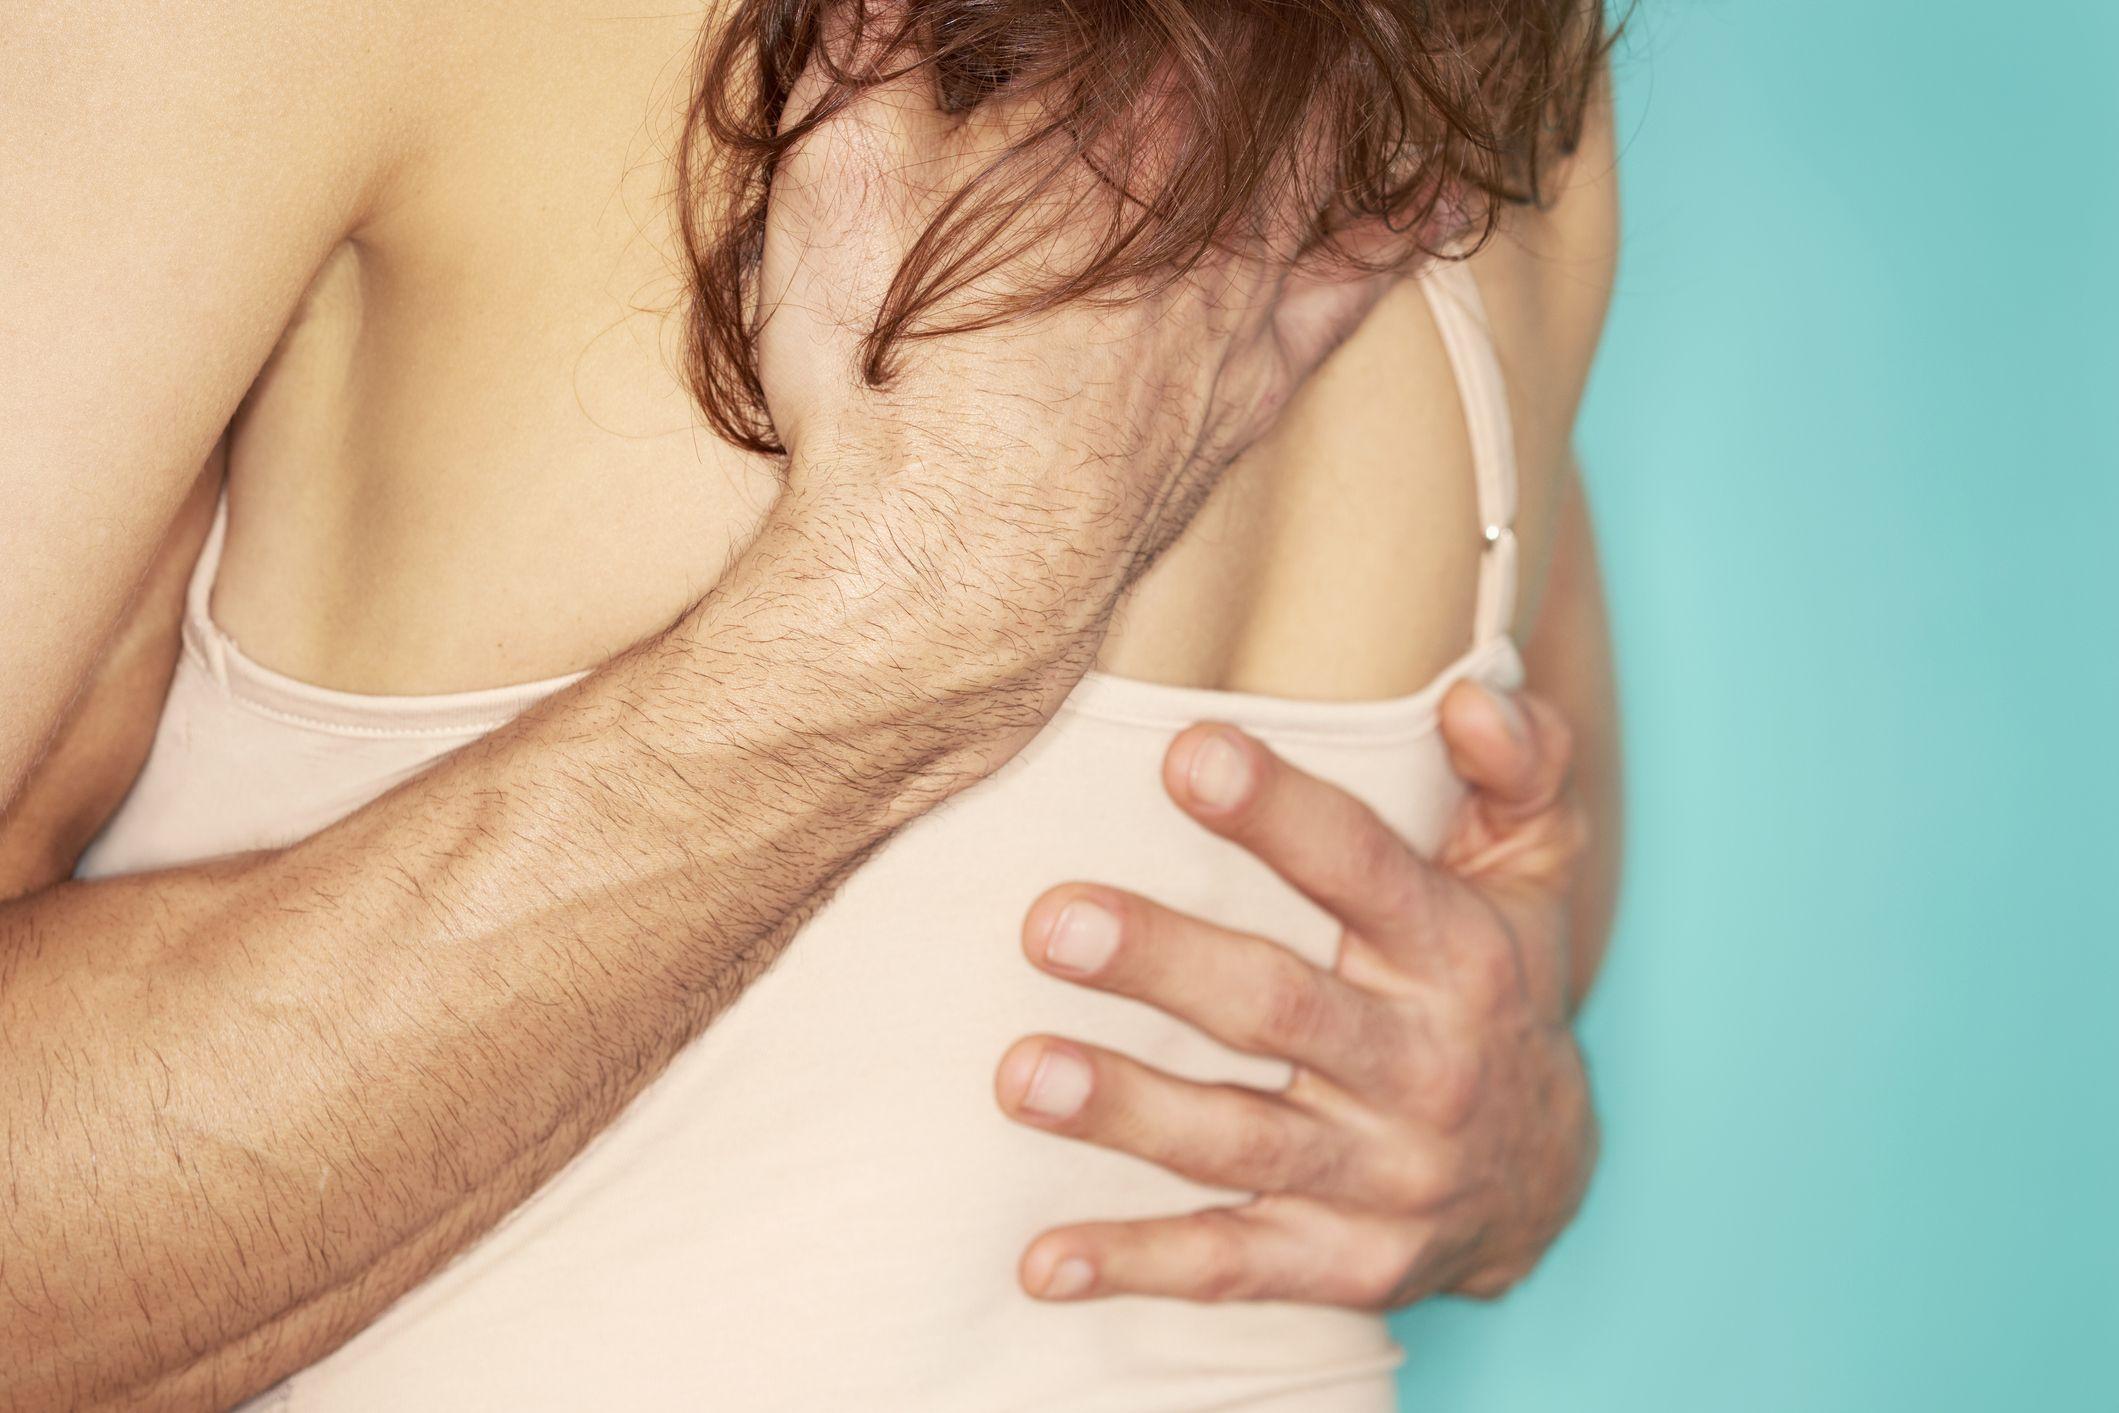 8 surprising health benefits of sex